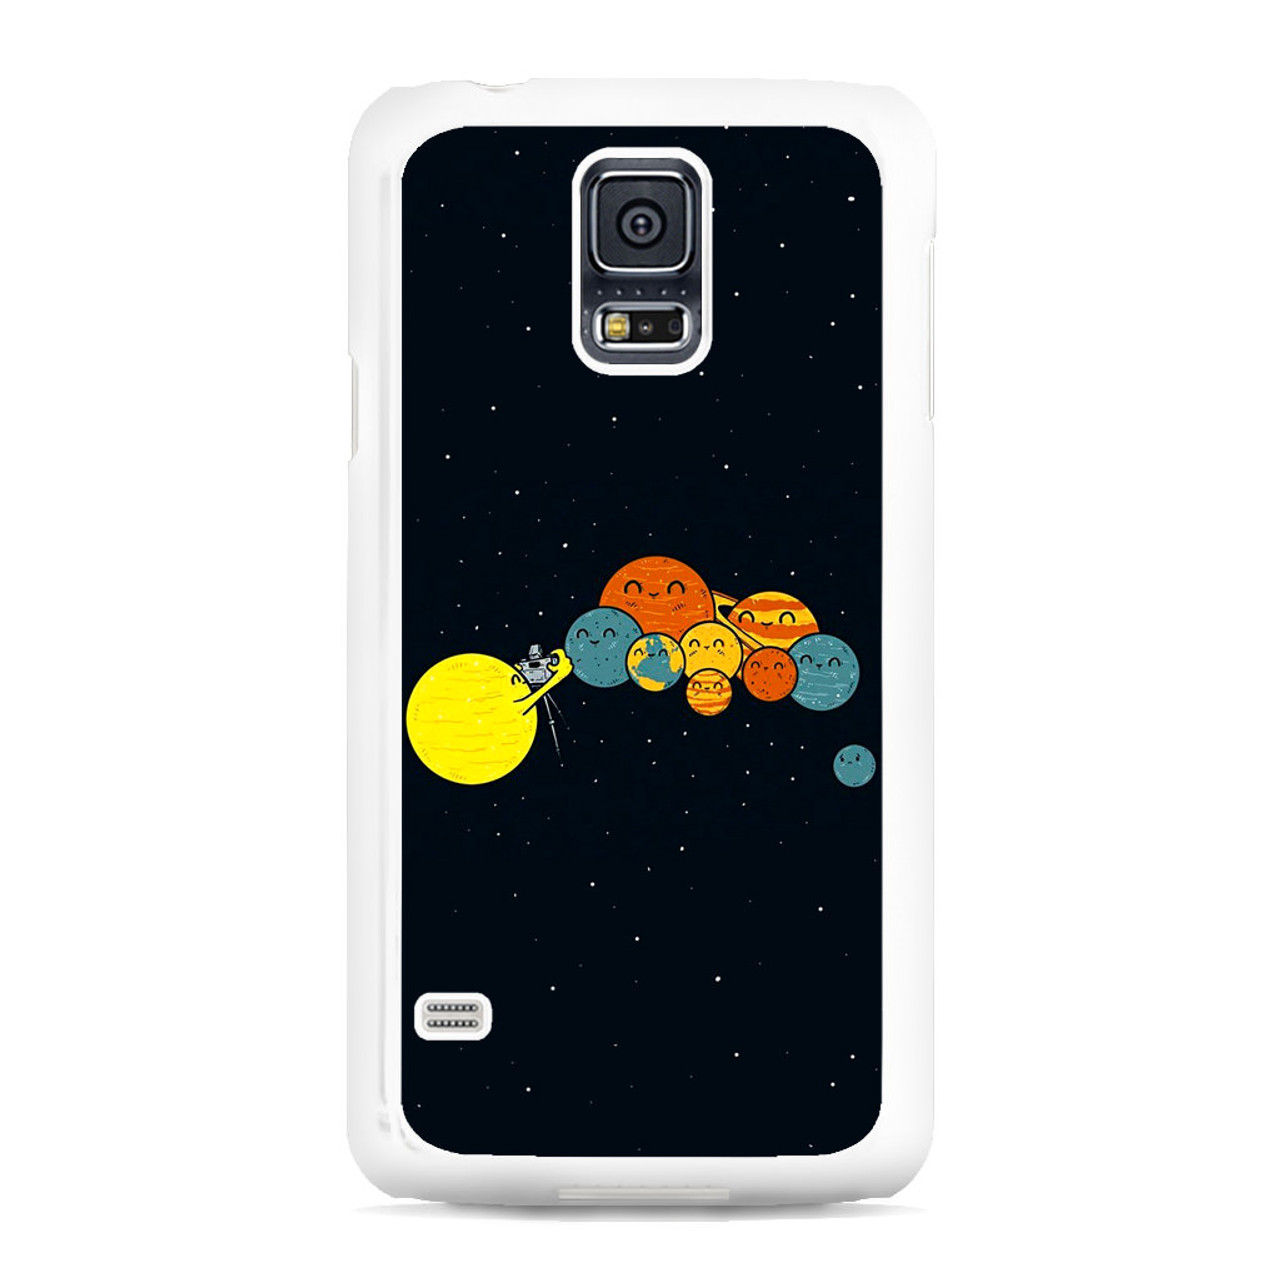 Cute iPhone Case Galaxy S5 Case Samsung